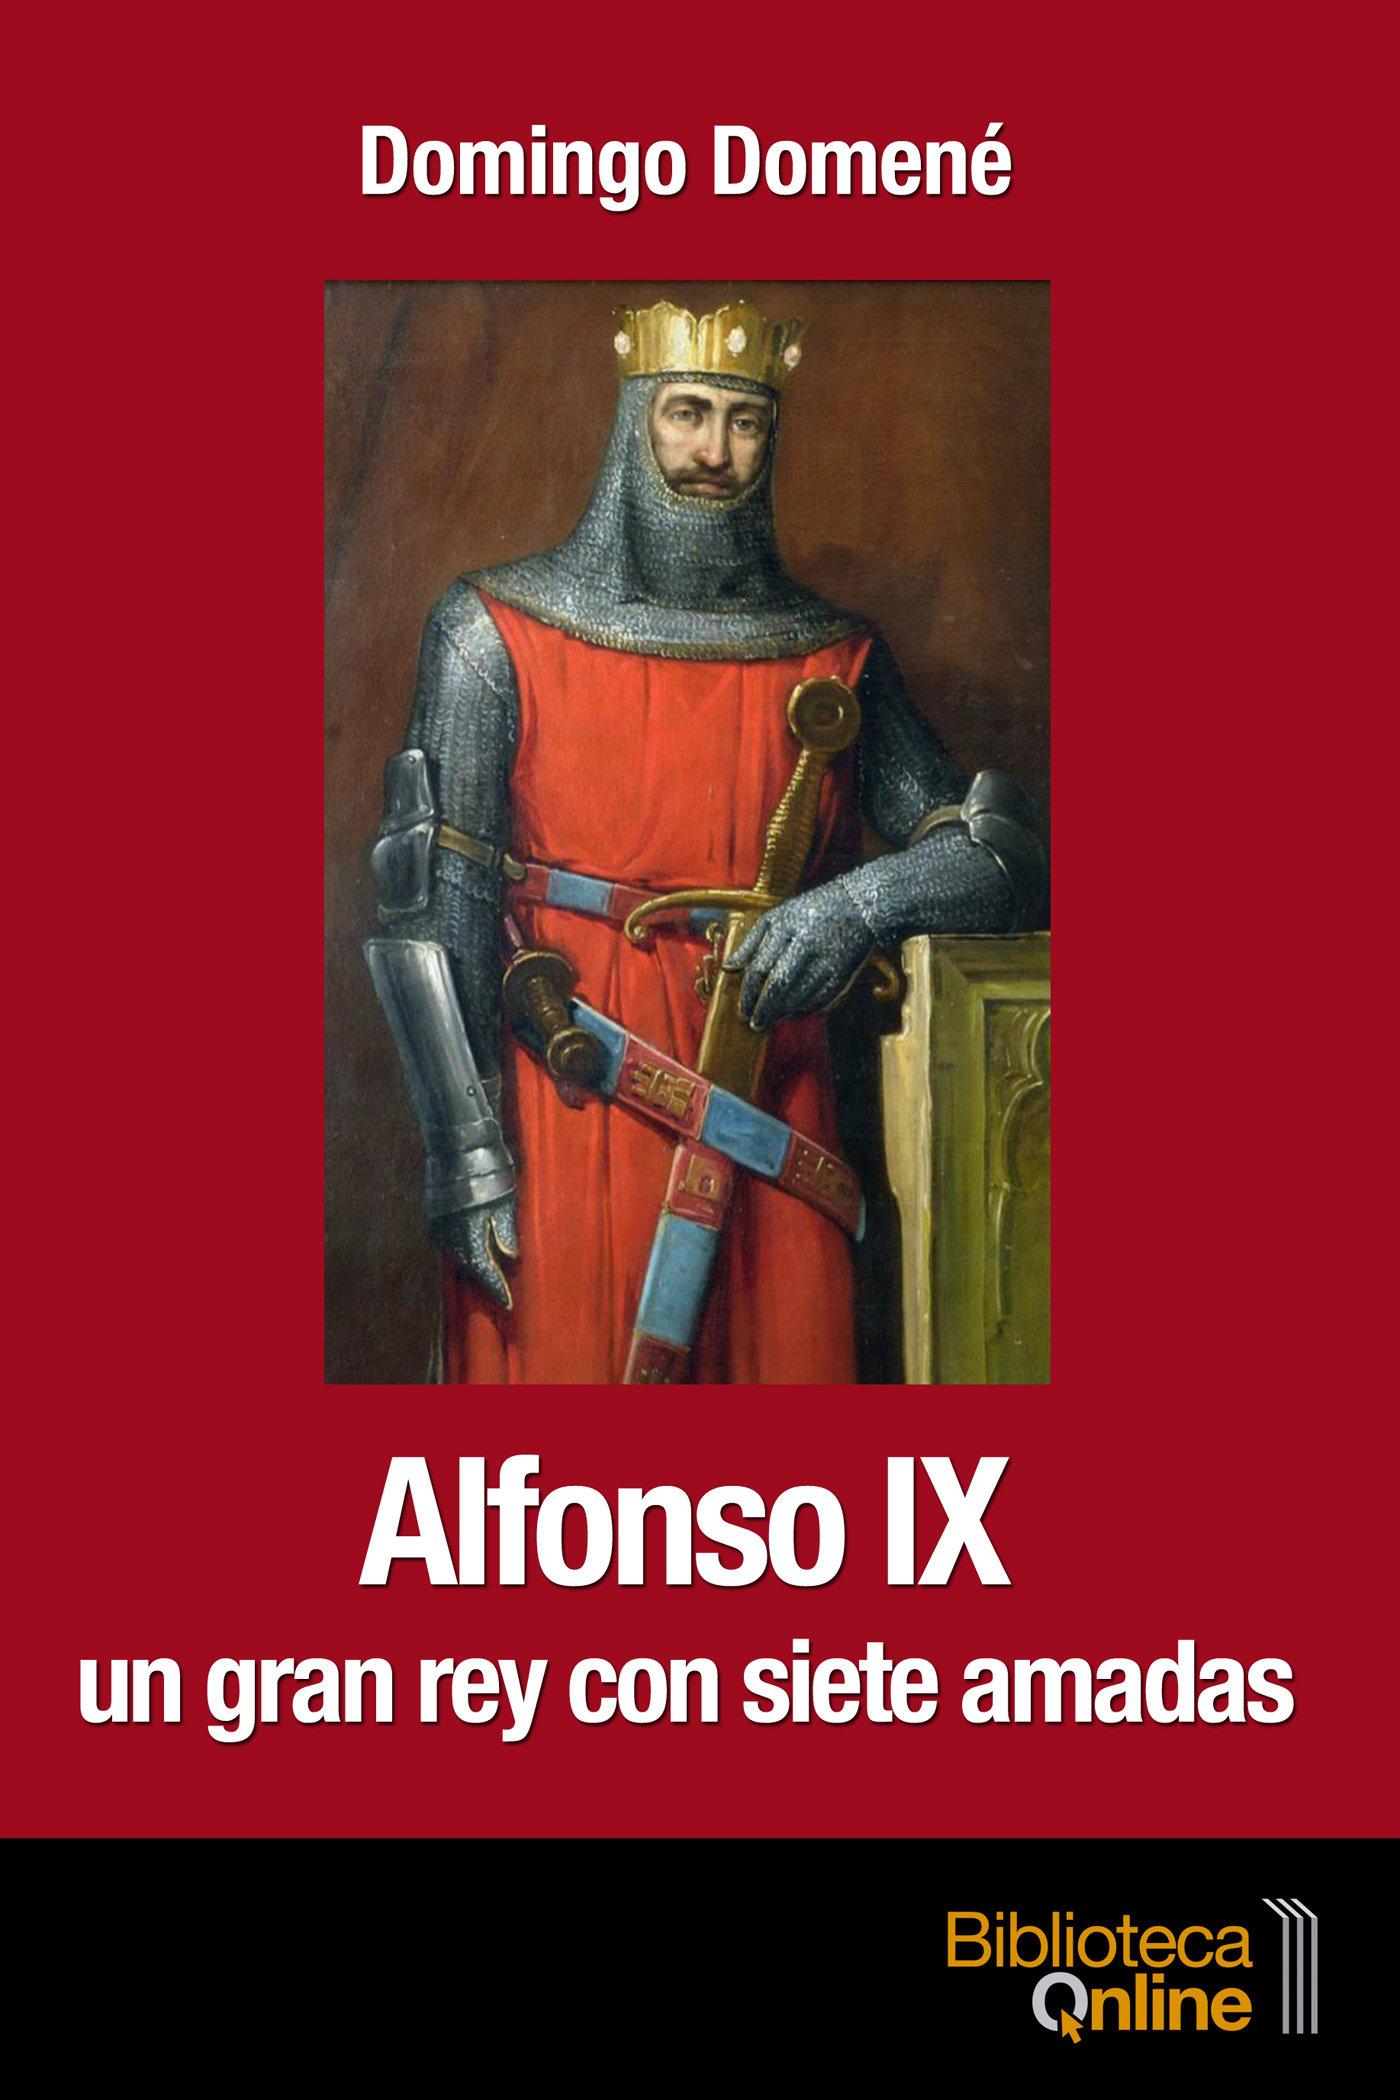 Alfonso IX: Un gran rey con siete amadas UGRCSA-DD